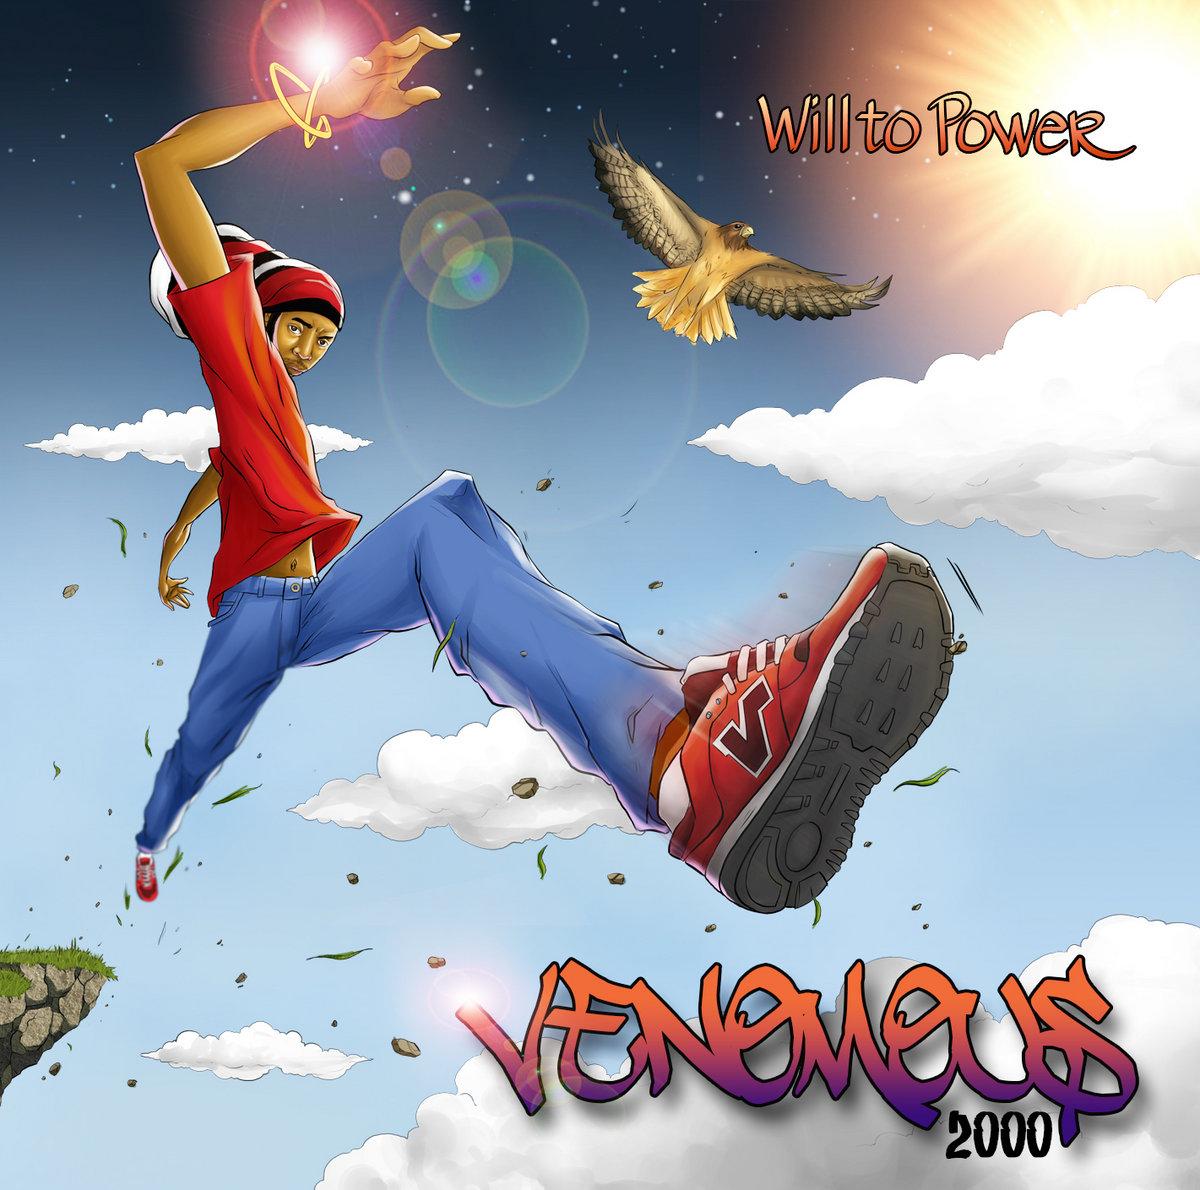 WILL TO POWER | Venomous2000